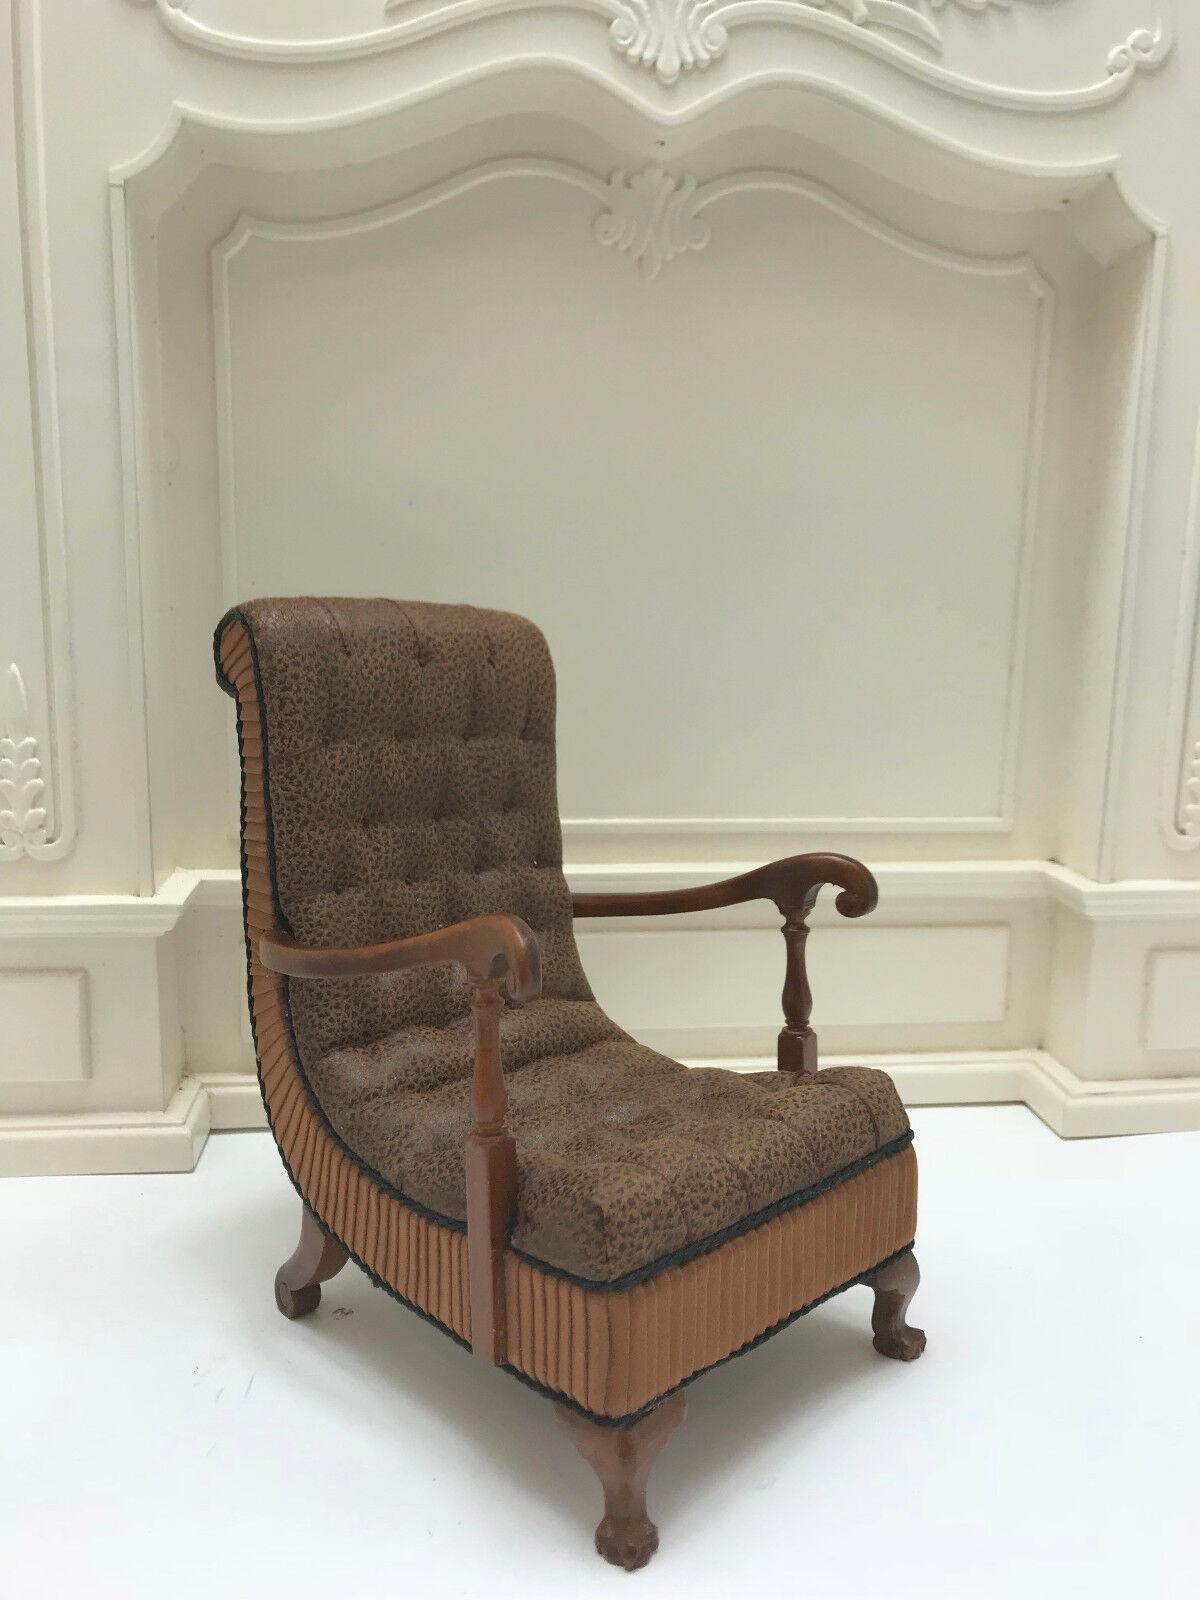 1/6 Maßstab Playscale Stuhl Barbie Modischer Royalty Blythe Bjd